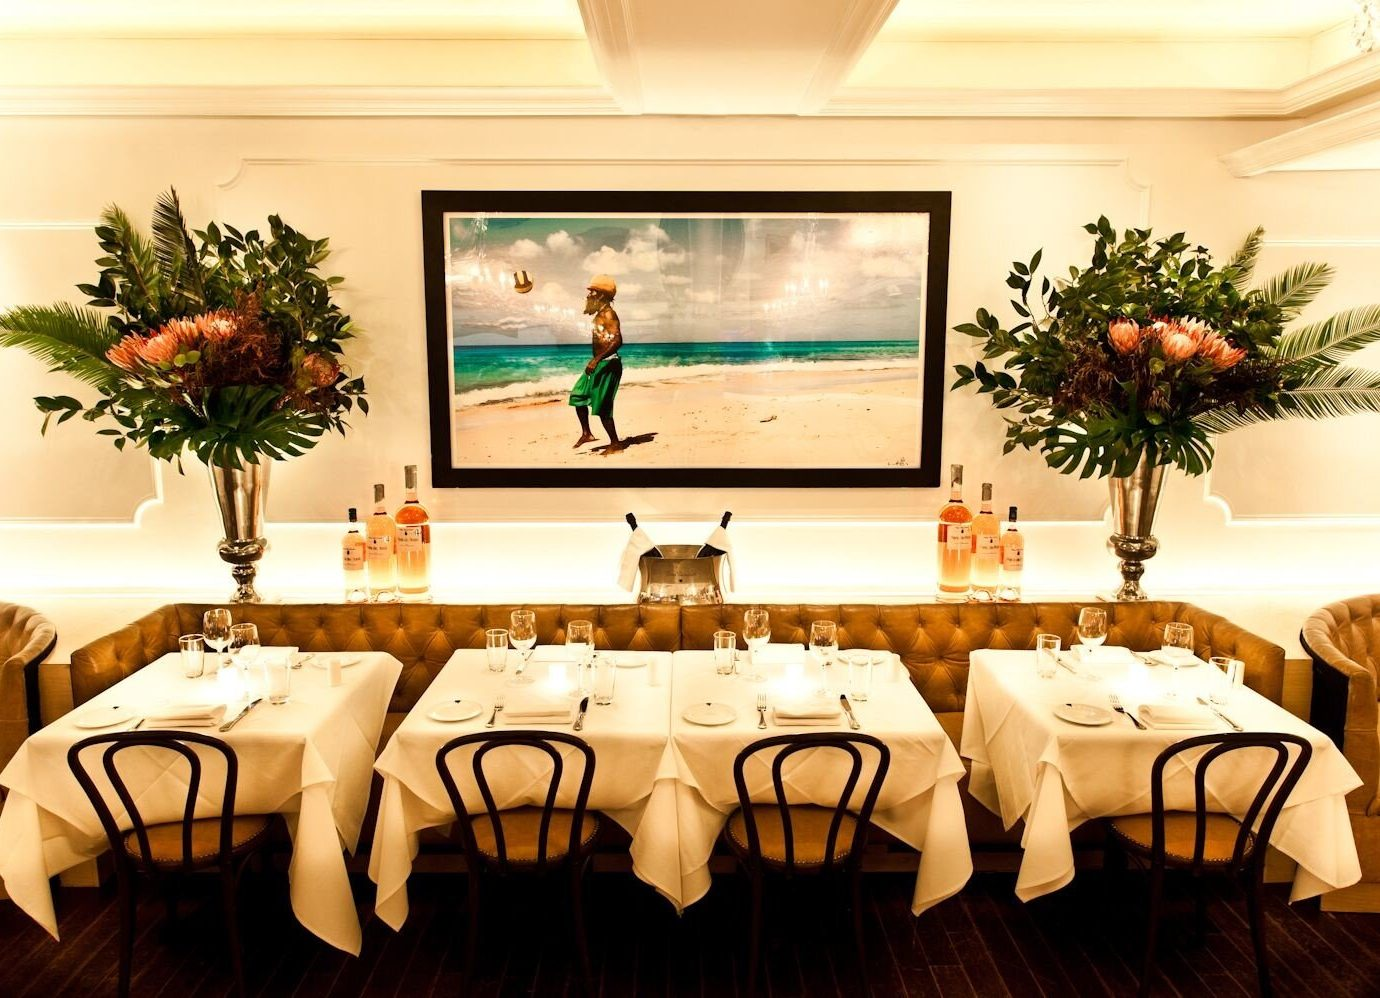 Style + Design floor indoor plant room Living restaurant wedding meal function hall ceremony banquet decorated interior design estate home wedding reception Design furniture several